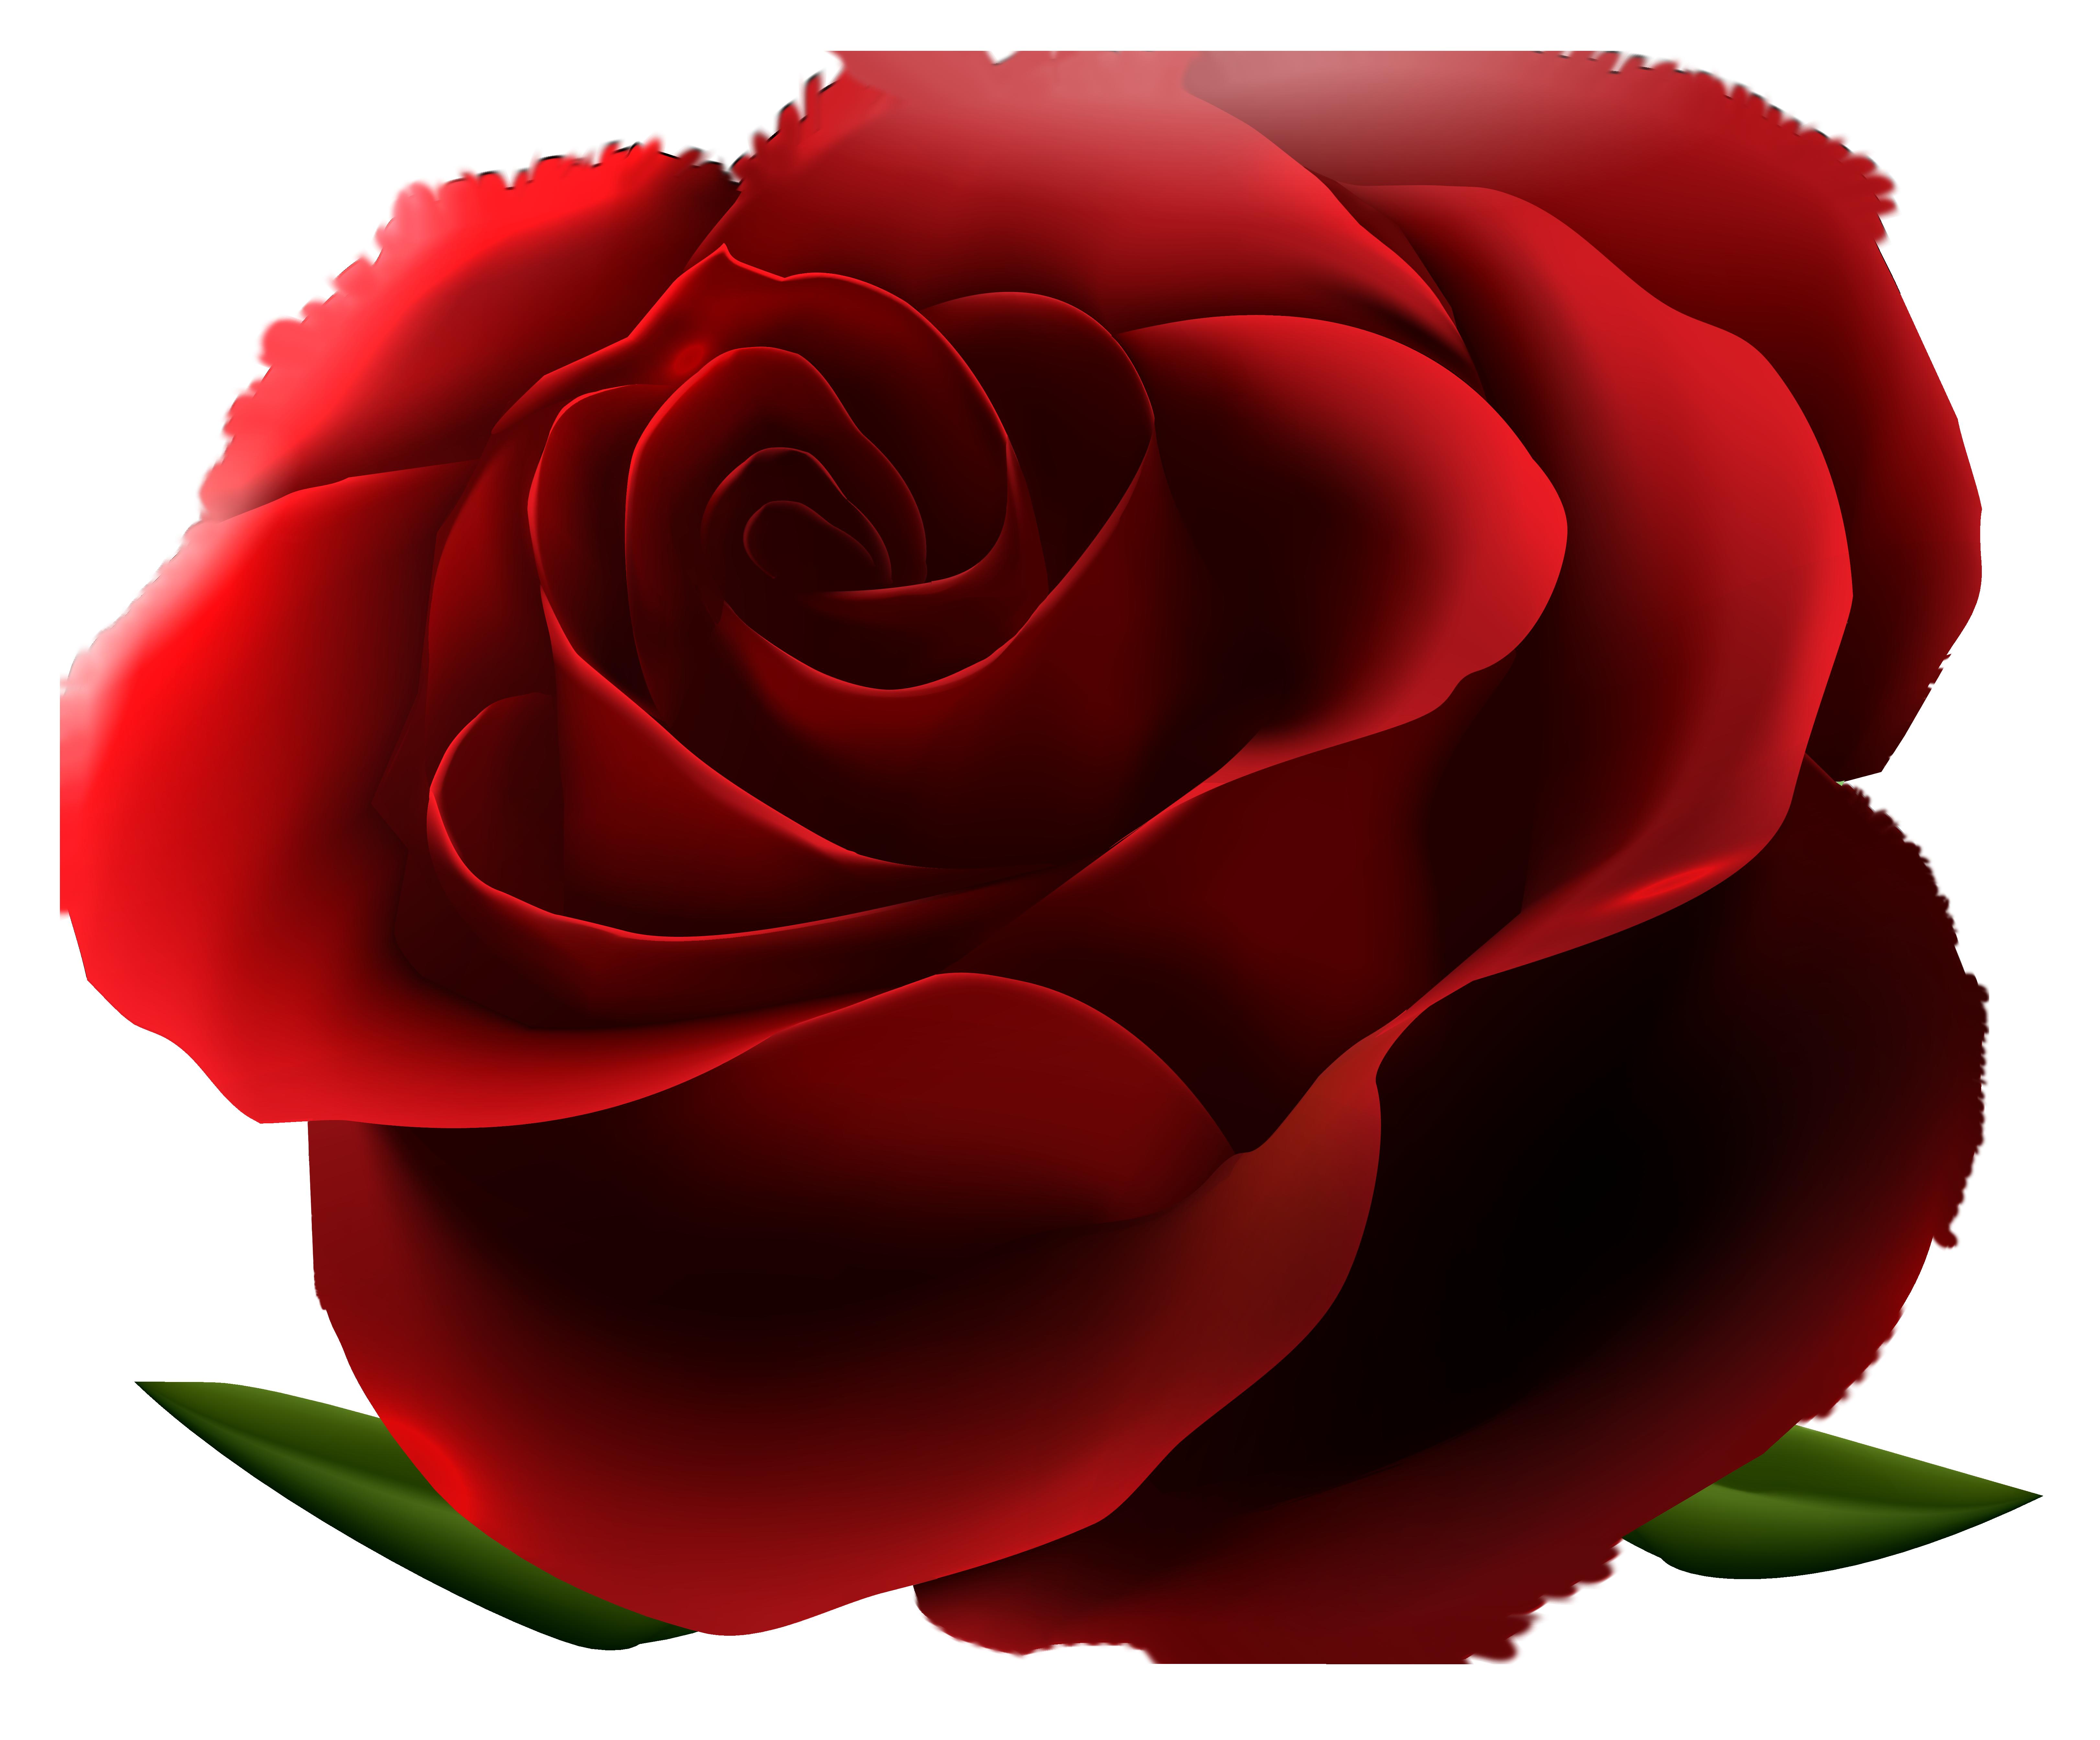 Craft clipart flower. Red rose transparent png